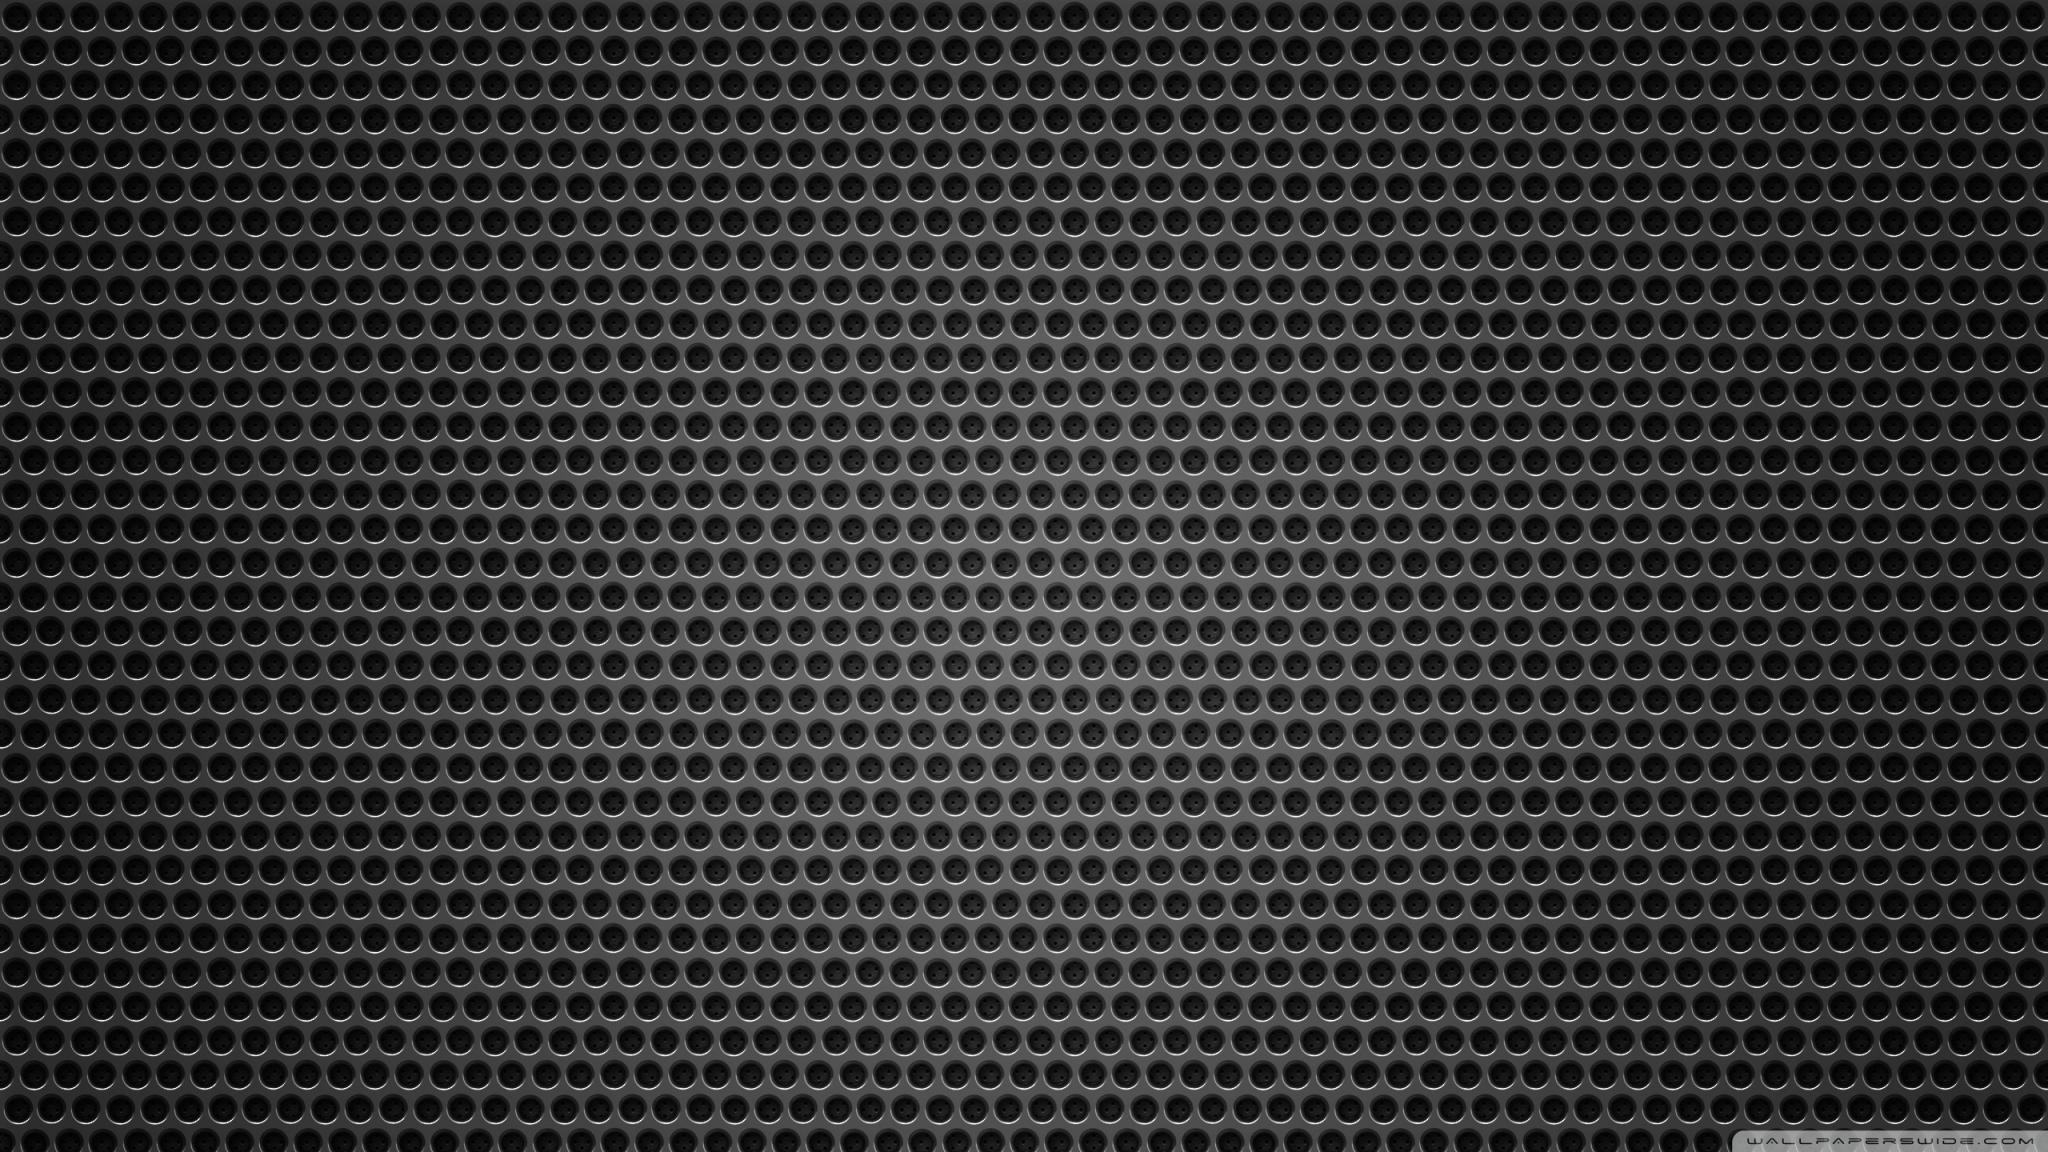 2048x1152 152 black background metal hole wallpaperjpg 2048x1152